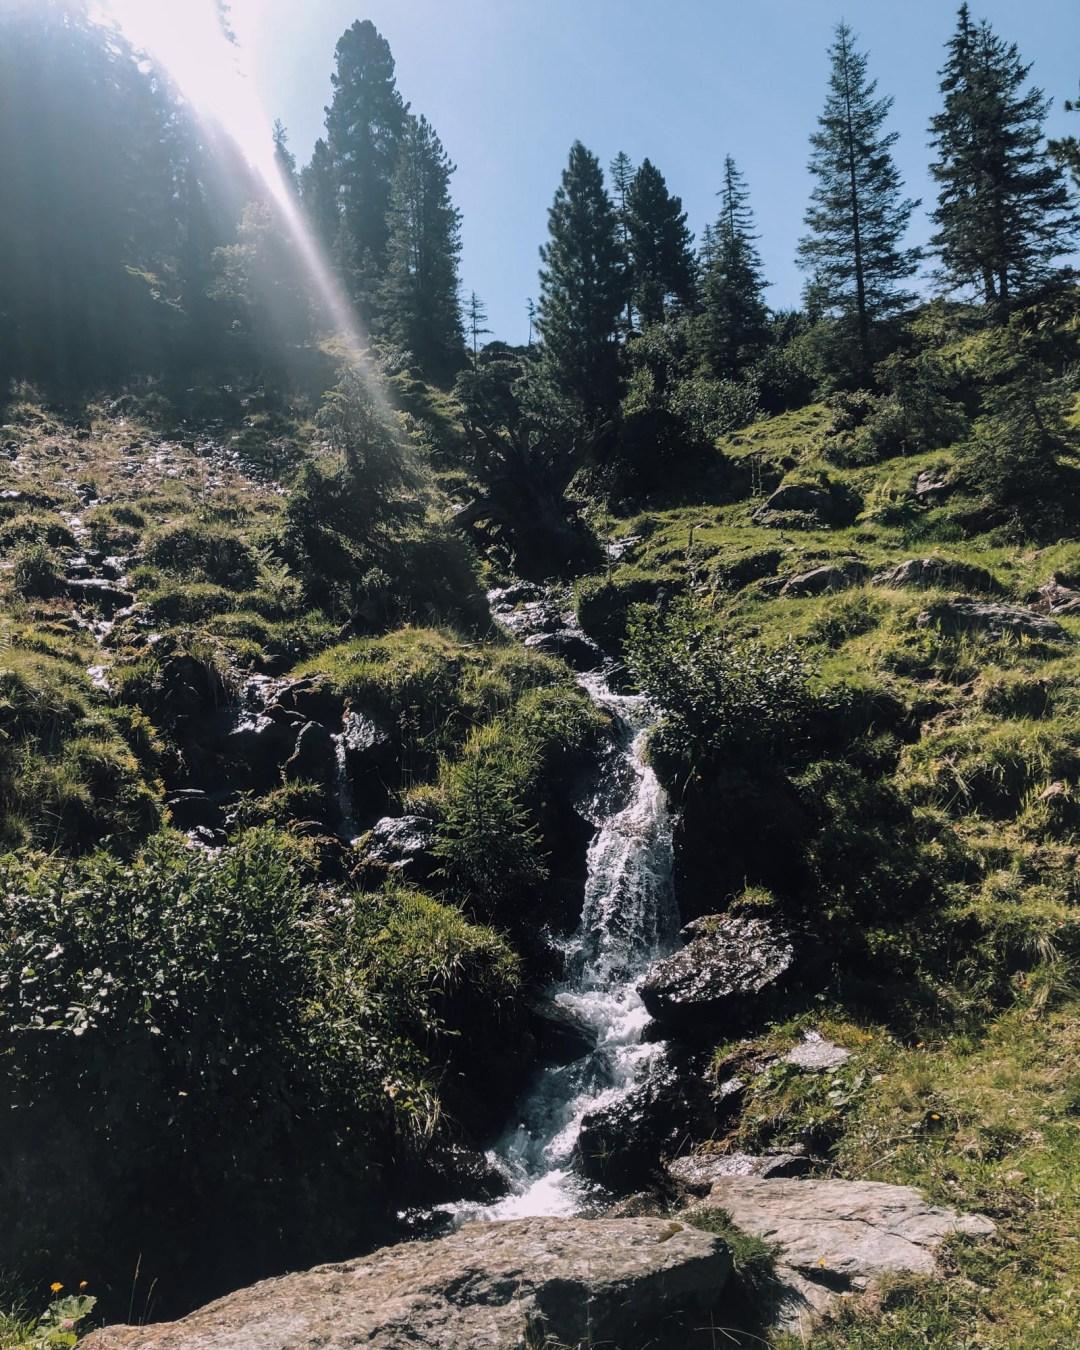 inastil, over50blogger, Alpbach, Alpbacherhof, Tirol, Austria, Visittirol, Wandern, Mountainbike, travelblogger, traveldiary, Urlaub, Urlaubinösterreich-11